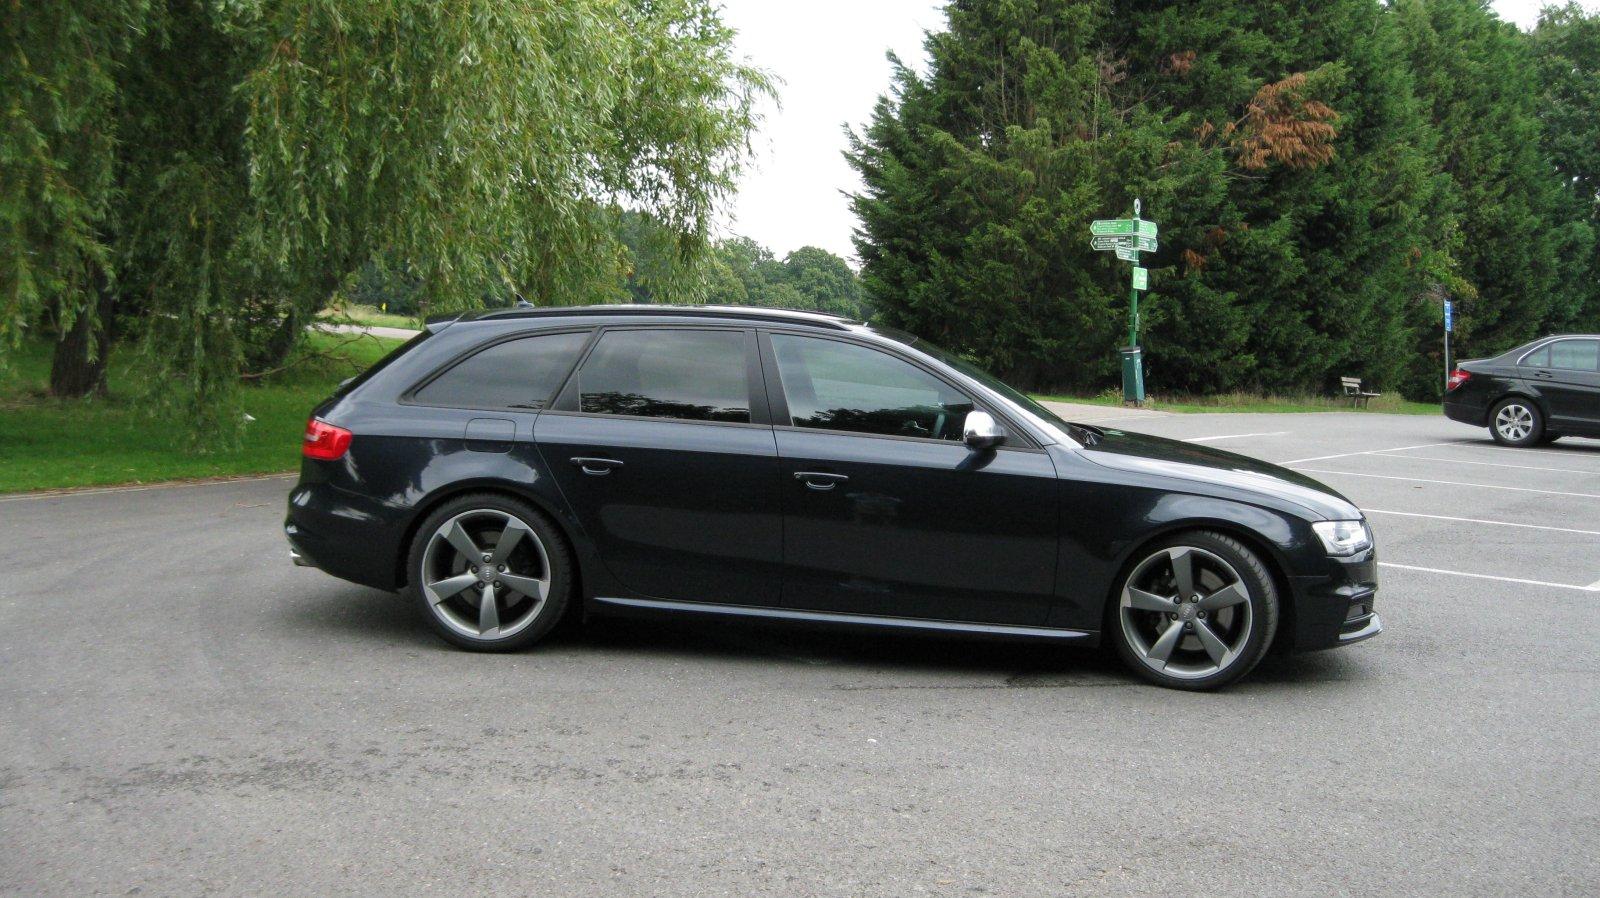 2012 Audi S4 Avant 3 0 Tfsi Quattro Black Edition For Sale